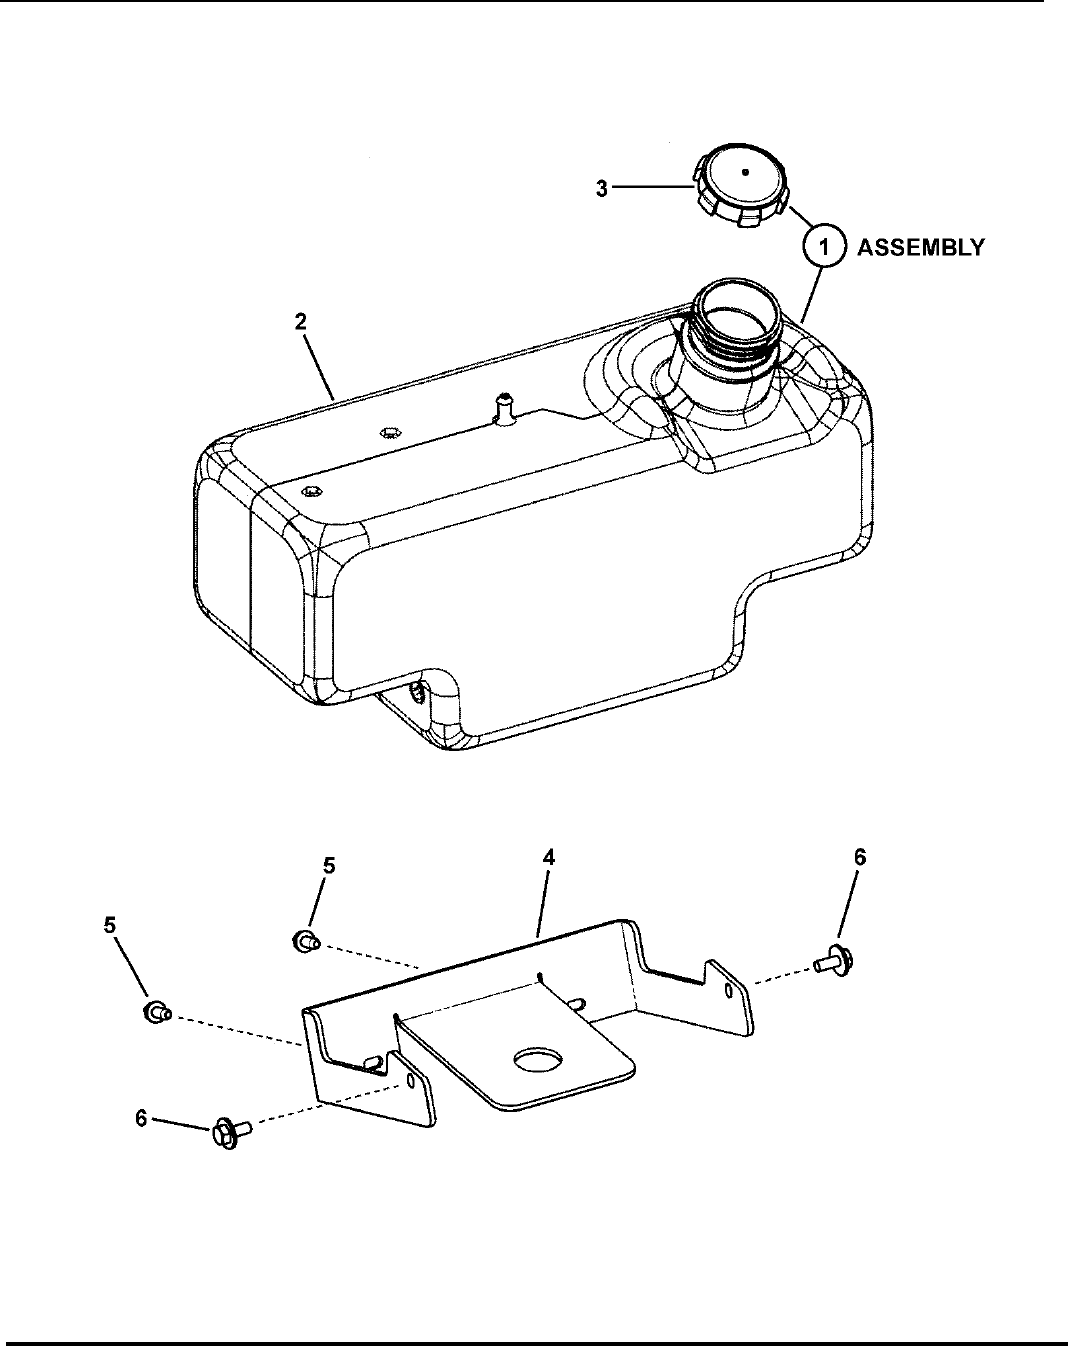 Snapper Lt 100 Series Users Manual PartsManual